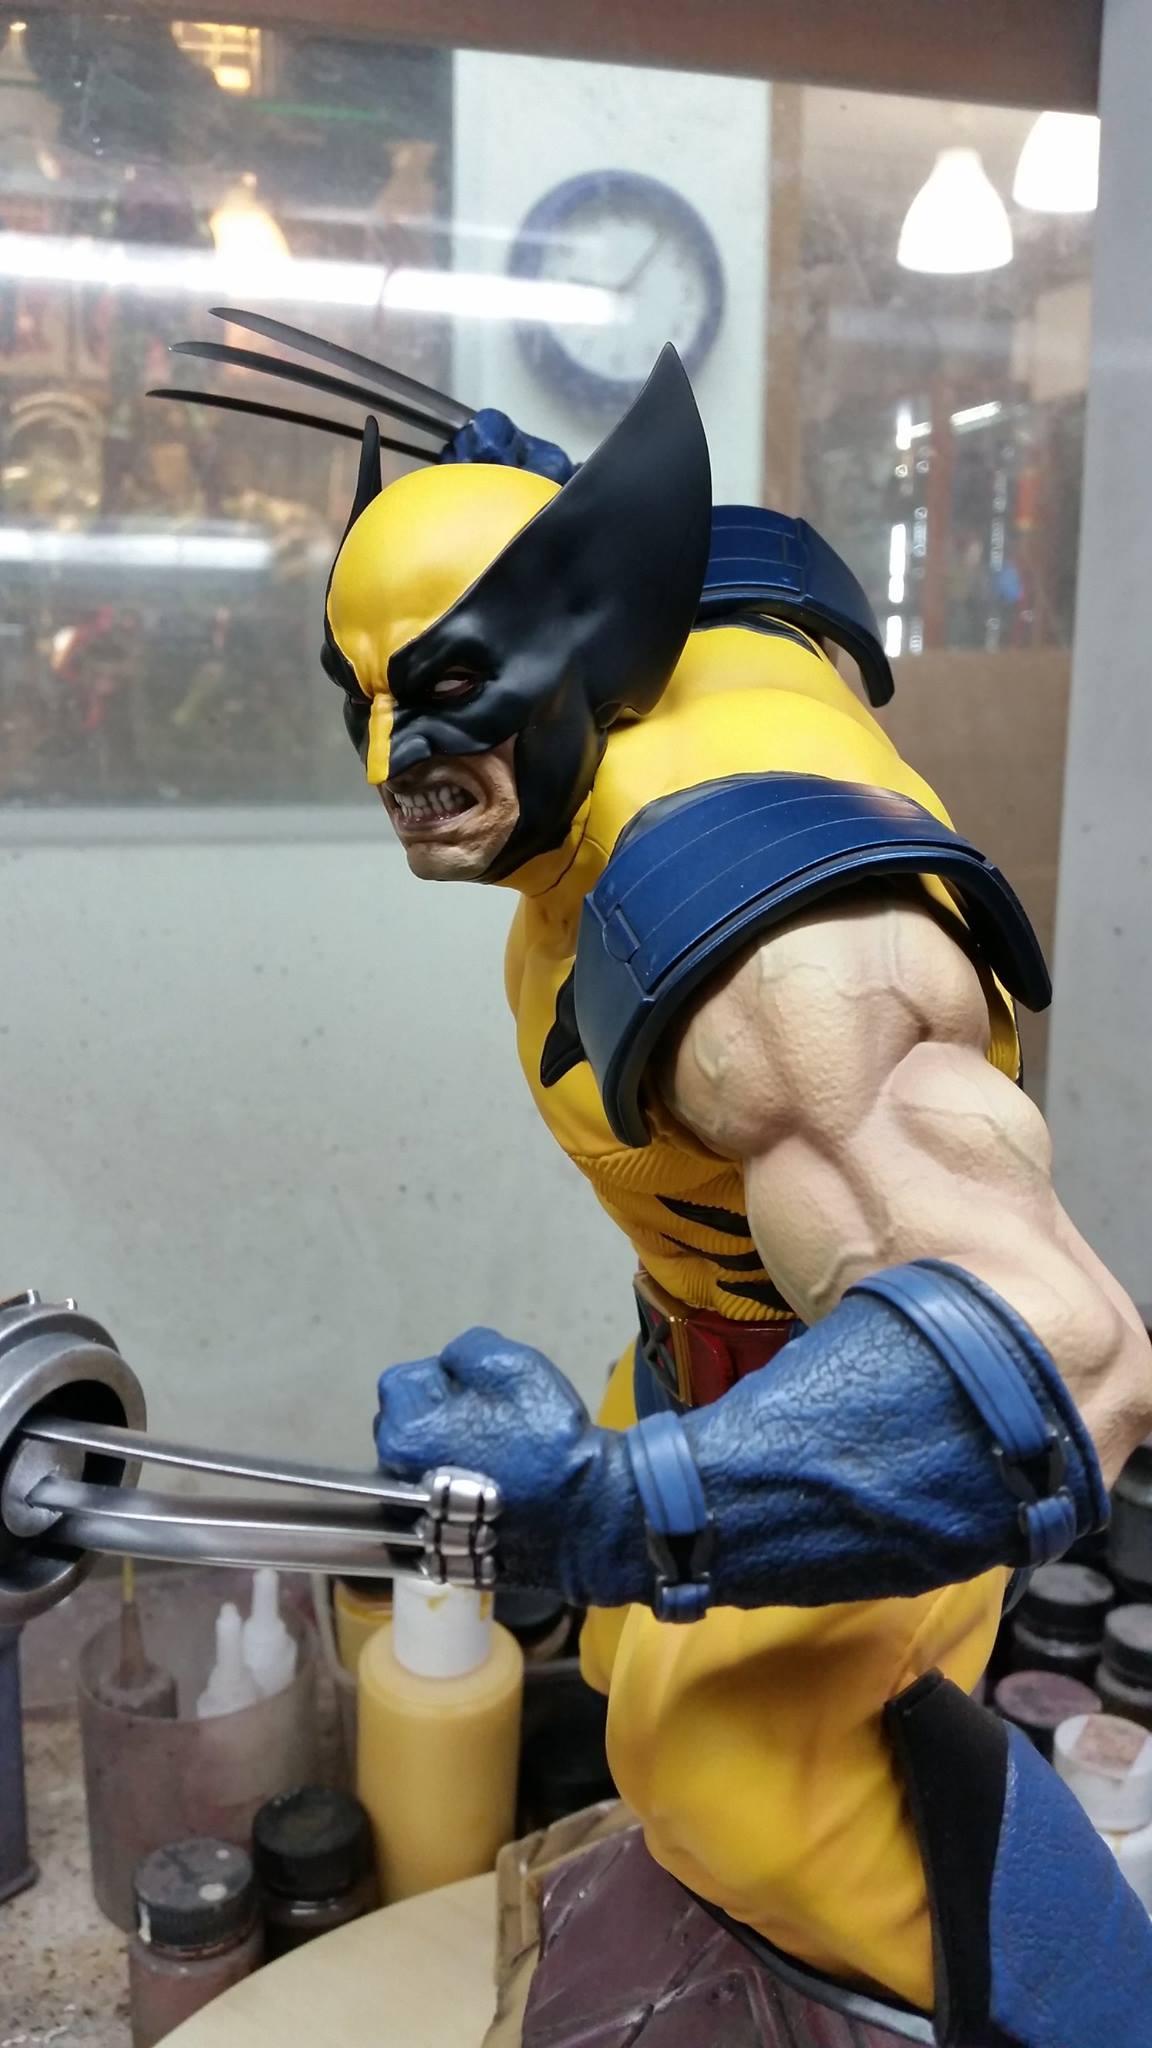 Premium Collectibles : Wolverine - Comics Version - Page 2 2408571048395914171090585097895961617309565397717o